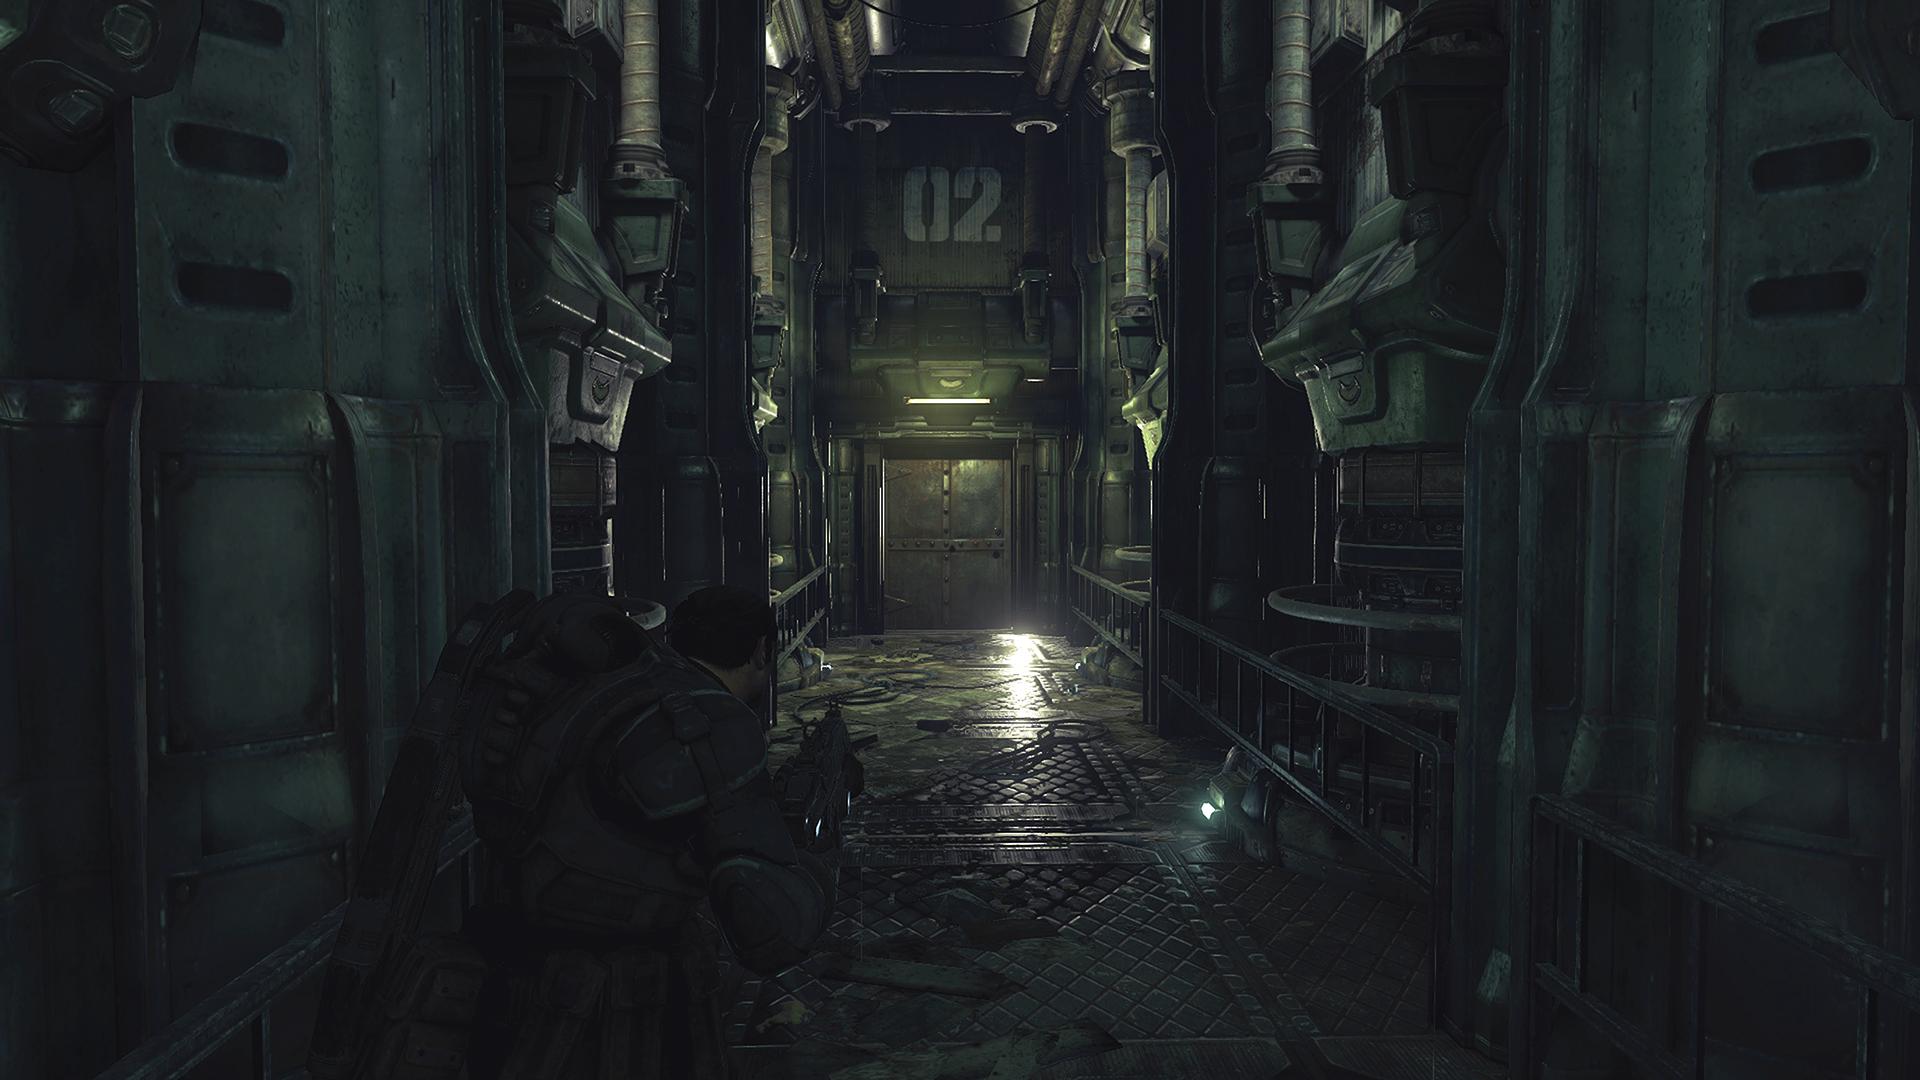 Galerie: Dark Souls 3, The Division, Hitman, South Park, SW: Battlefront 110478